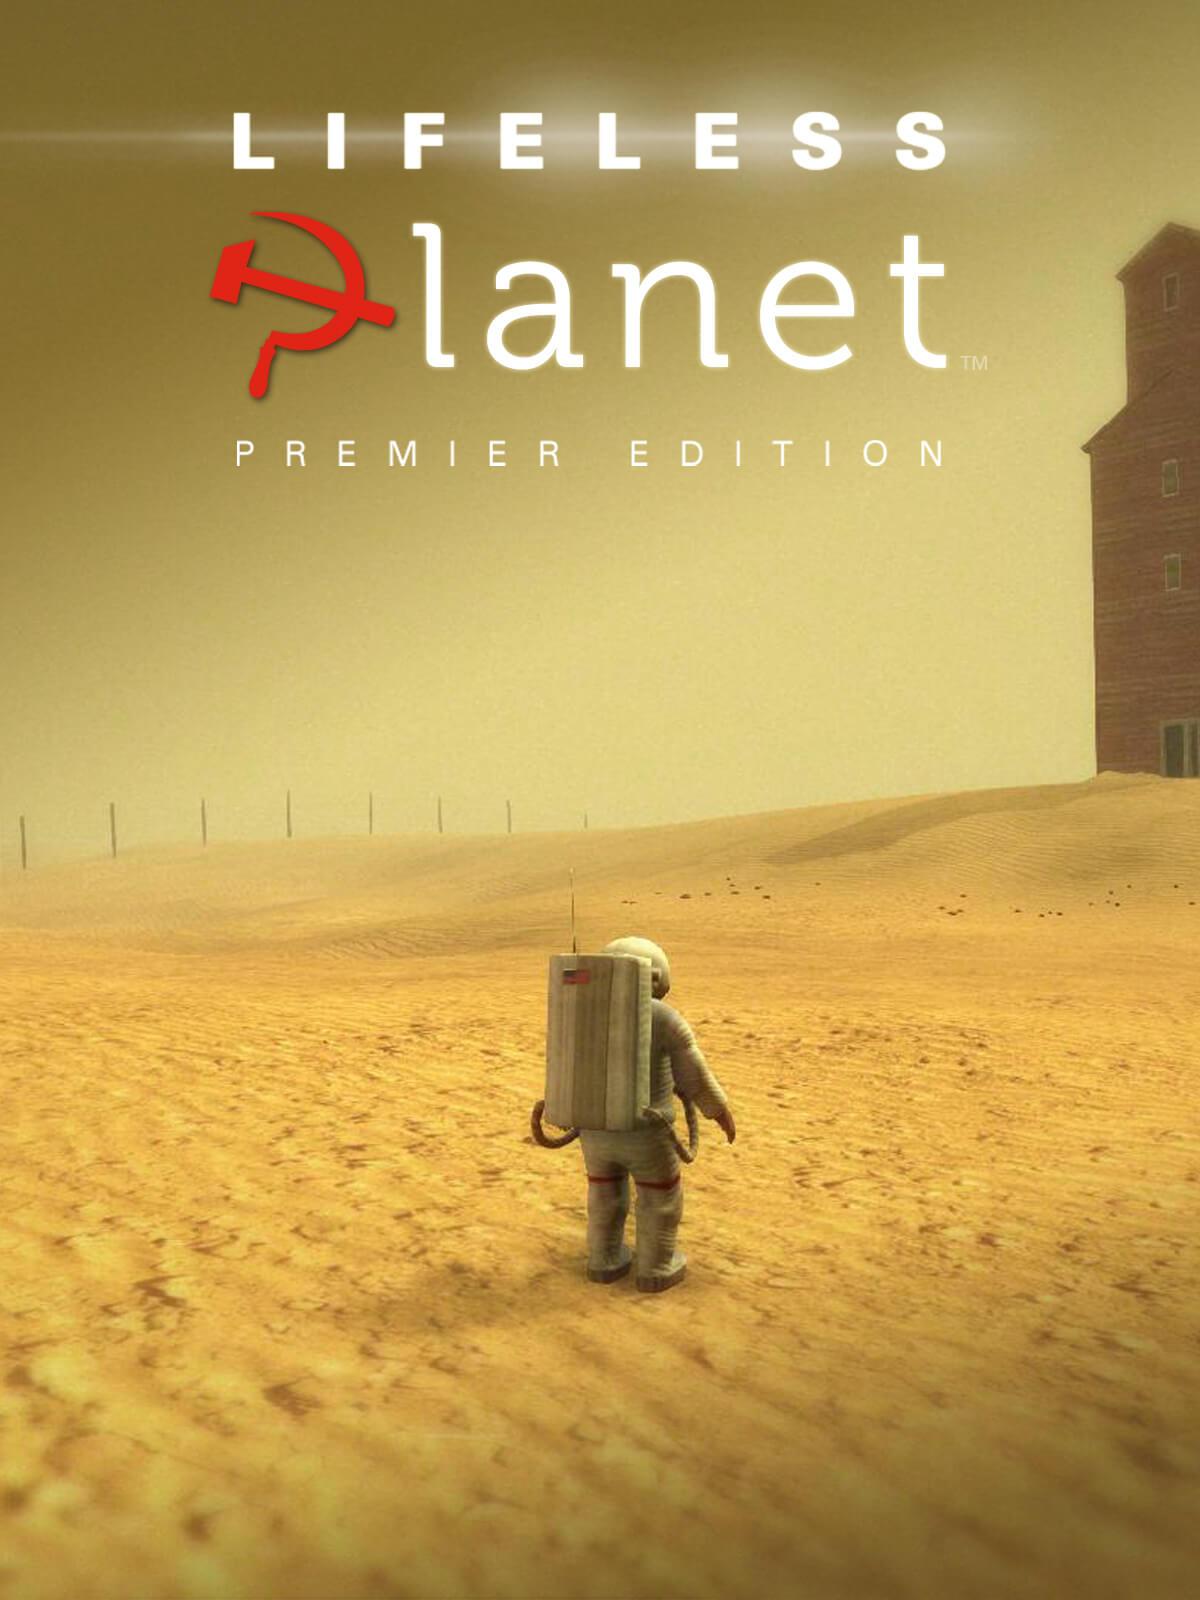 Lifeless Planet PREMIER EDITION (PC) gratis im Epic Store ab 9.7.20